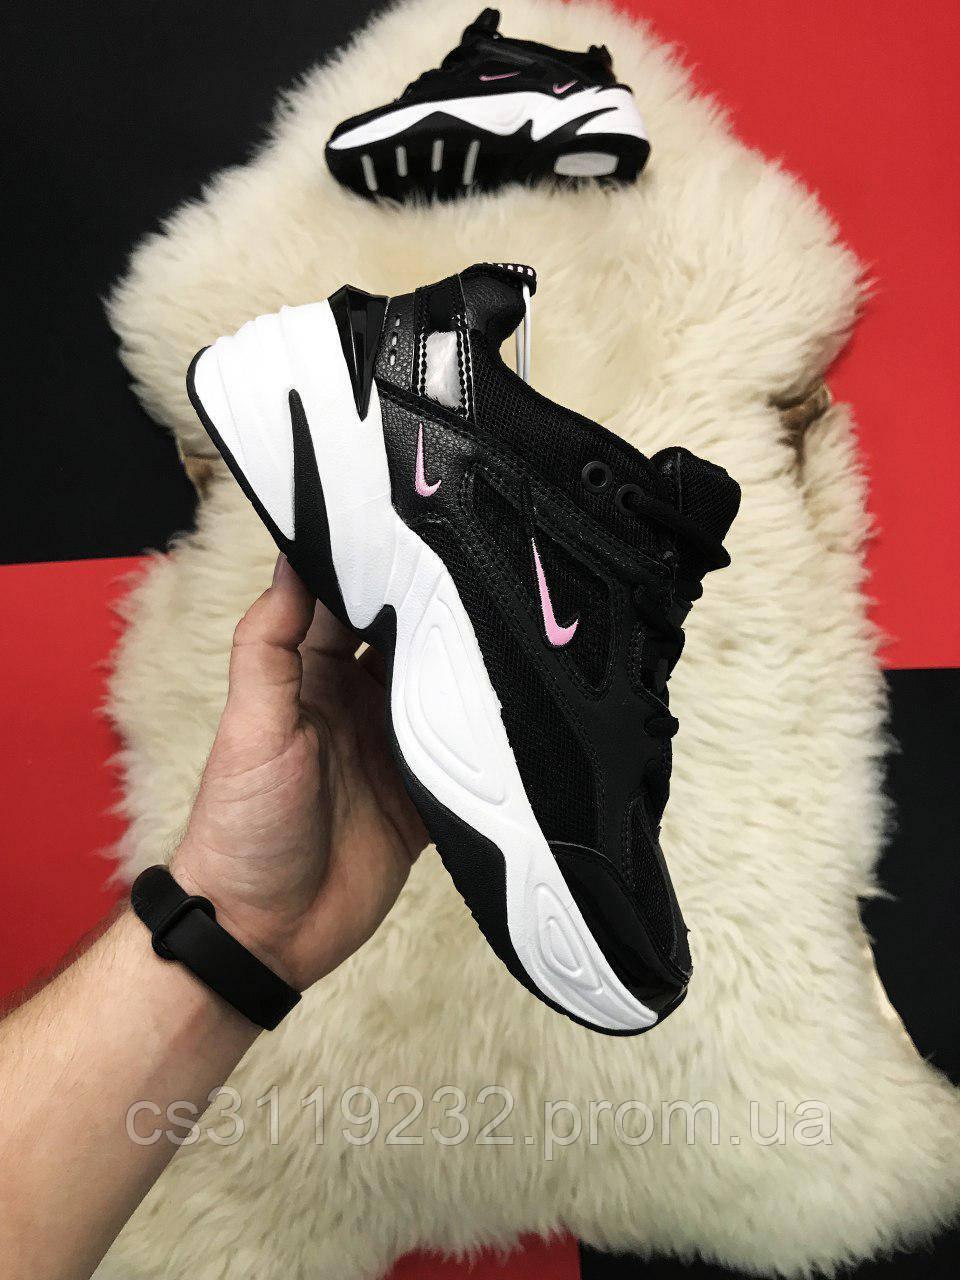 Женские кроссовки  Nike M2K Tekno Black White Pink logo (черные)